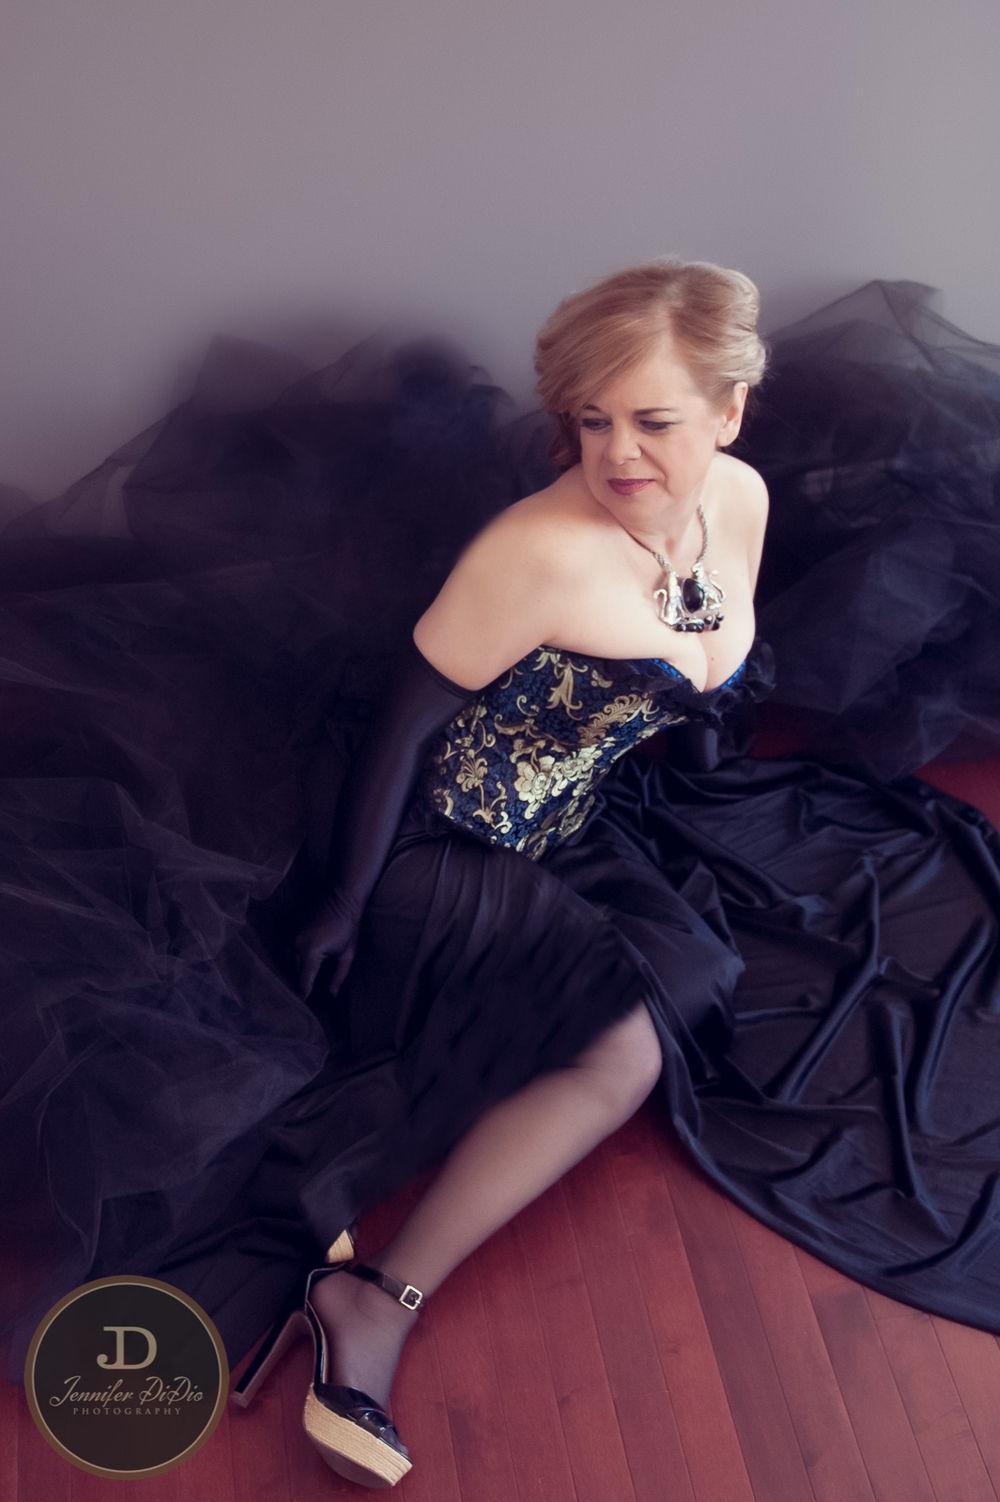 Jennifer.DiDio.Photography.Wroe.Judi.2014-209.jpg